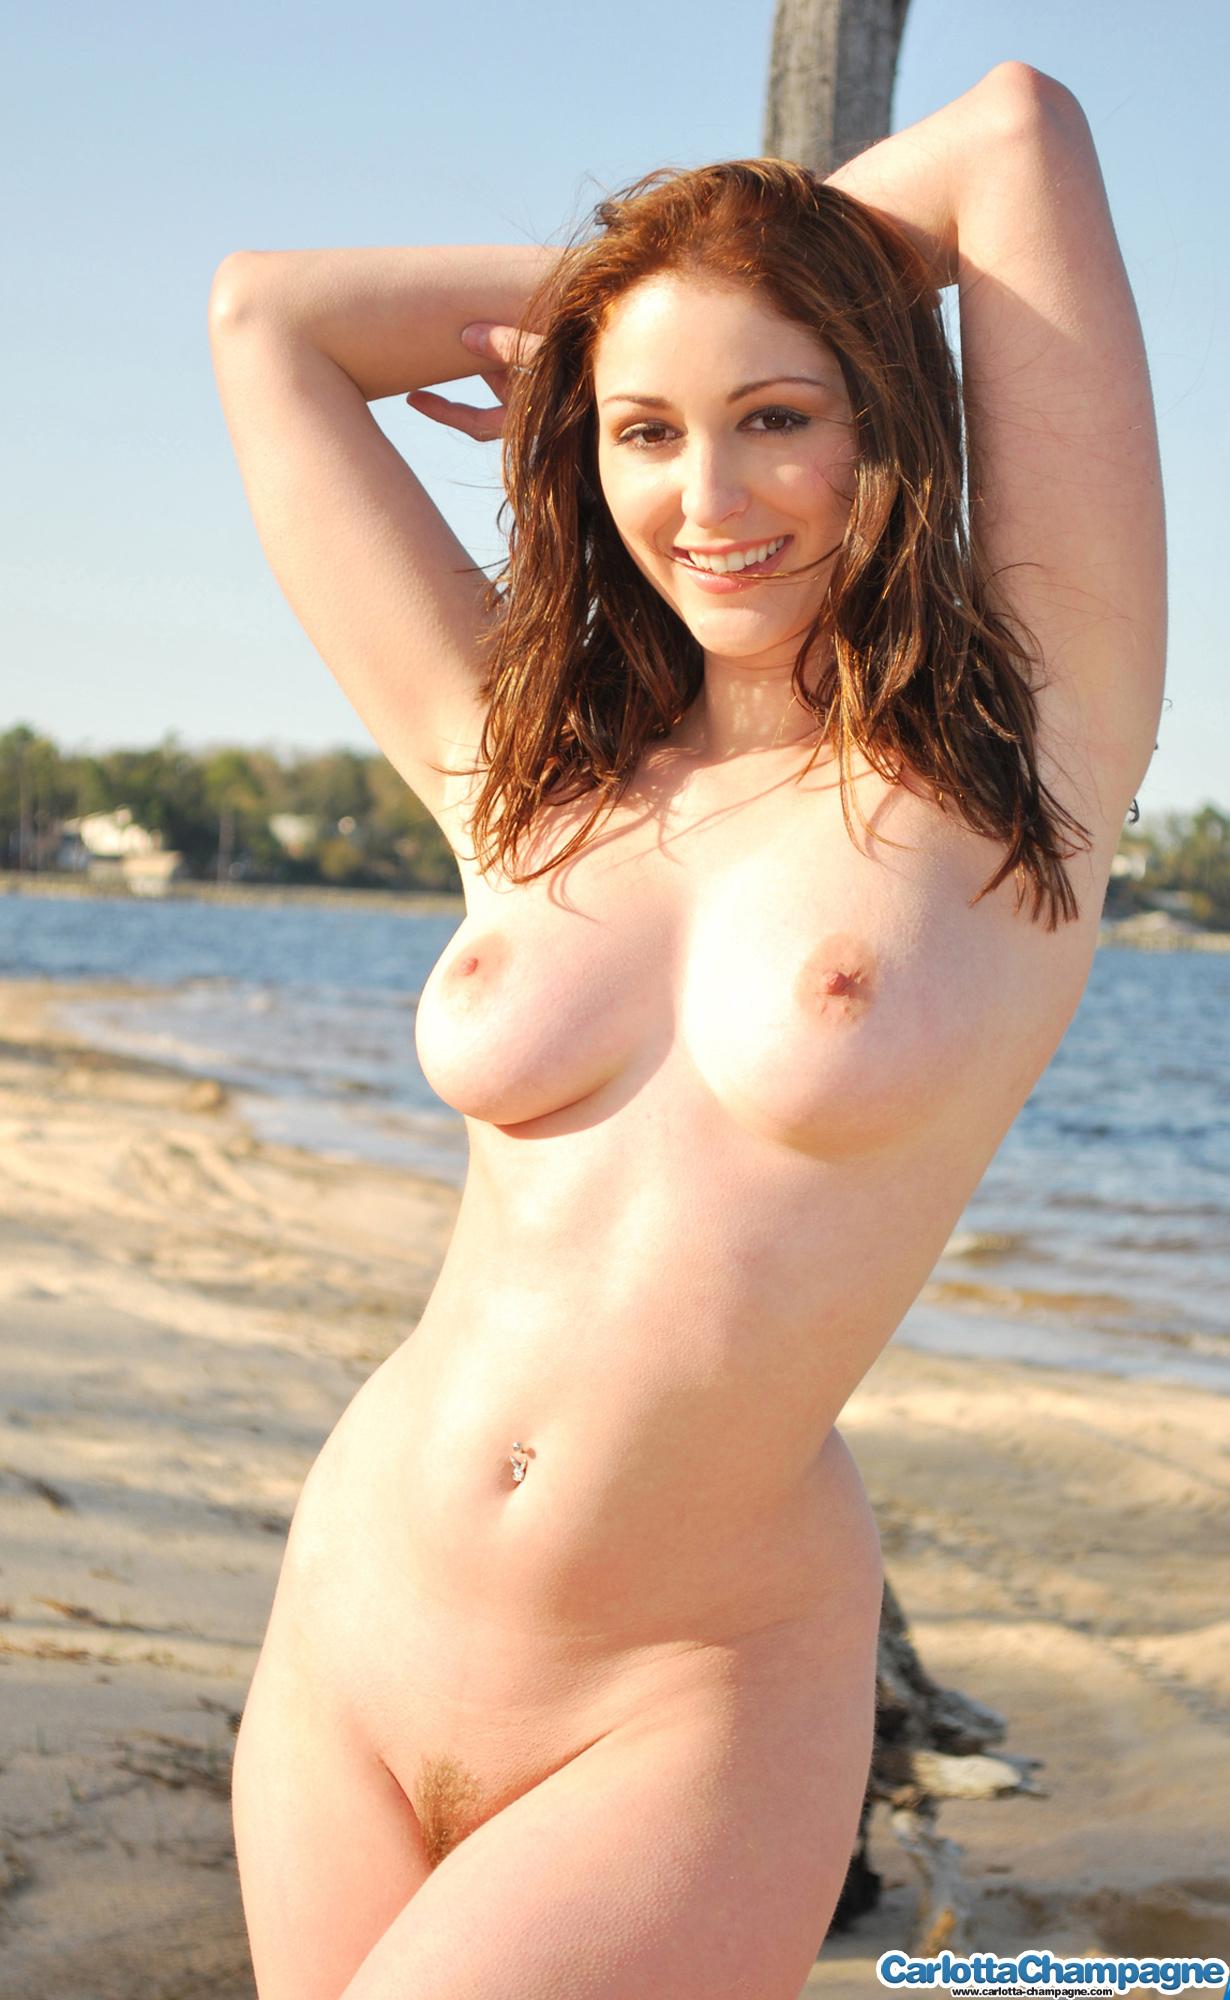 Girls mud public beach nudity videos taylor juggs pics